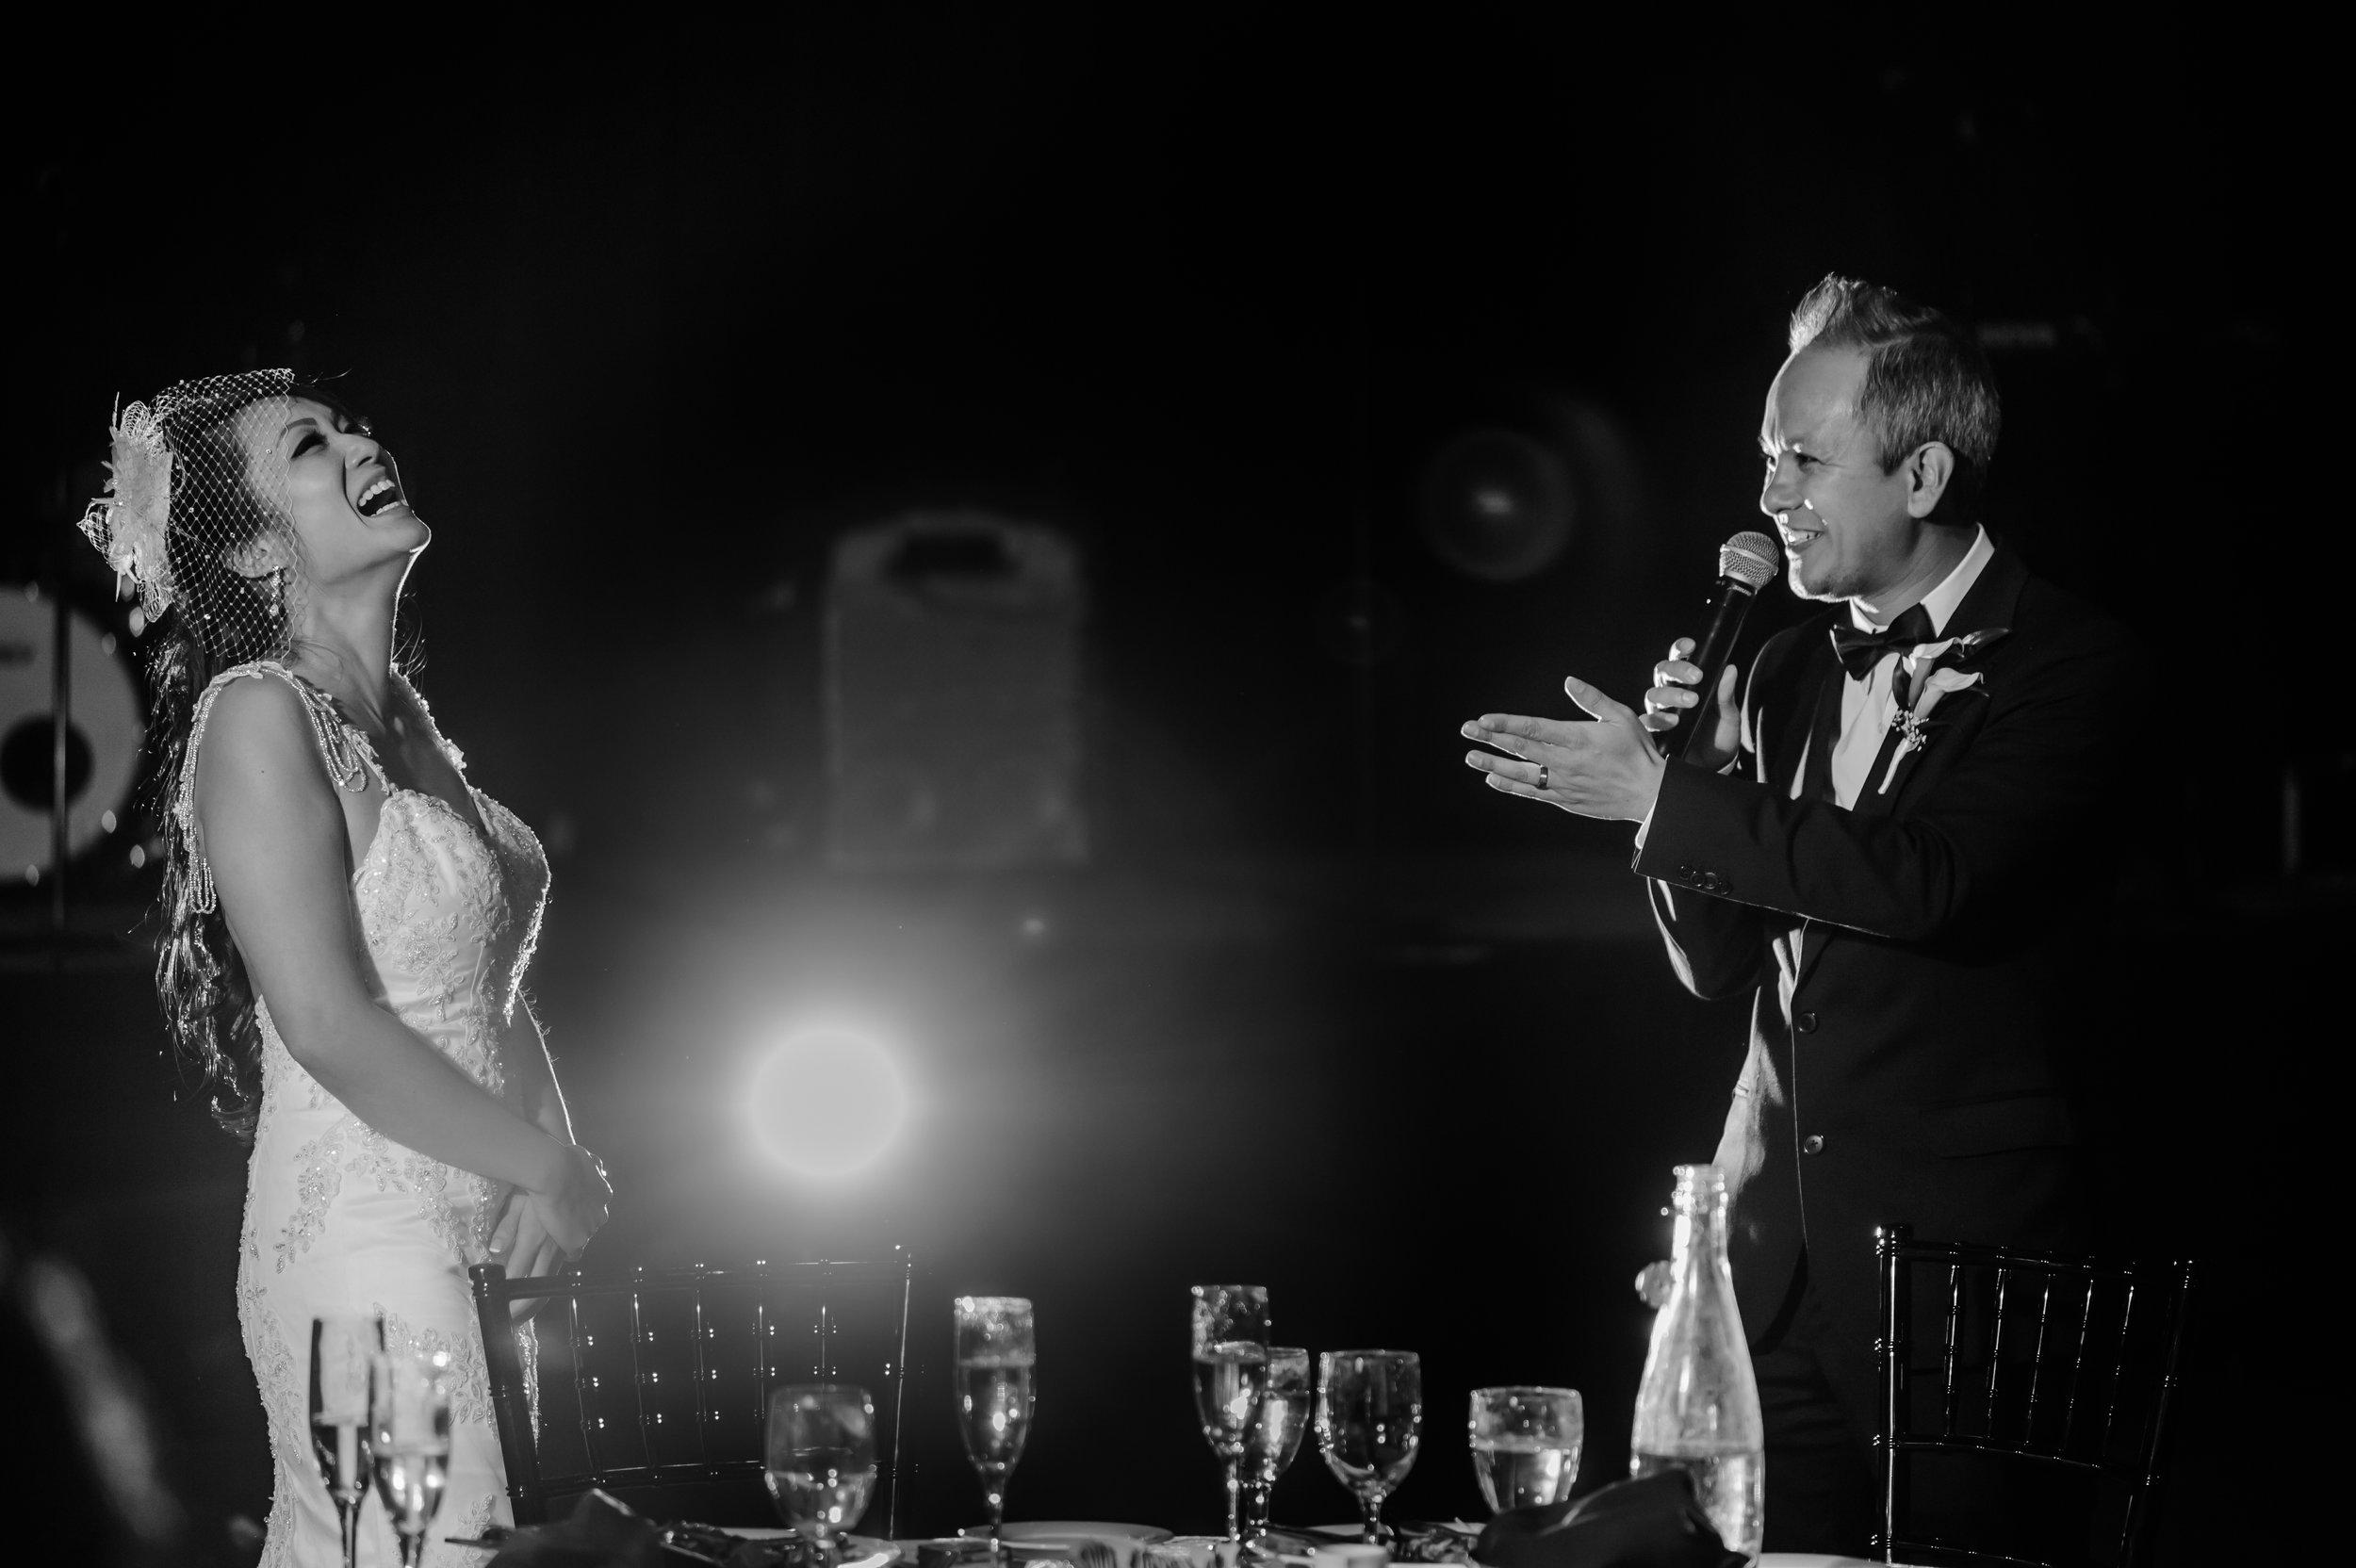 camilla-thuy-064-memorial-auditorium-sacramento-wedding-photographer-katherine-nicole-photography.JPG